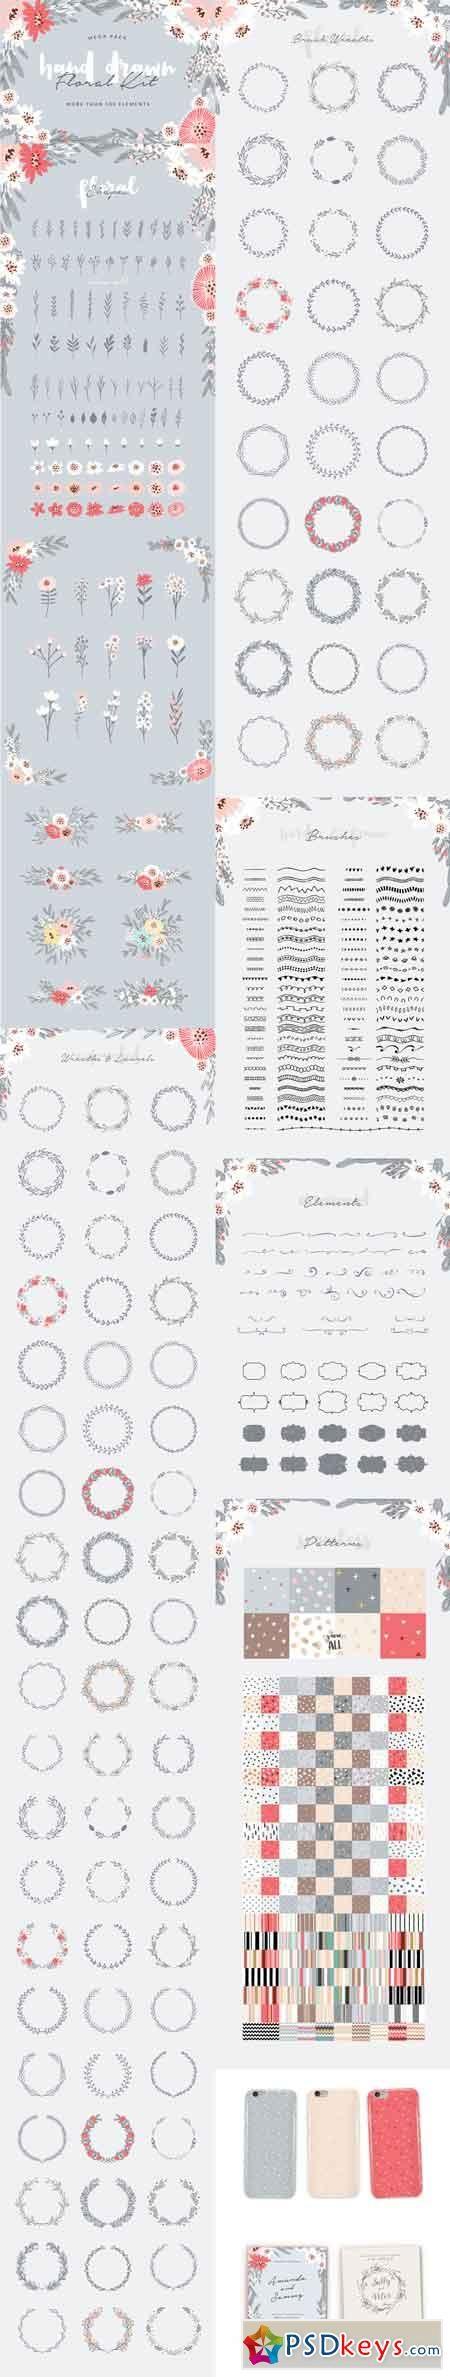 Hand Drawn Floral Kit 747754